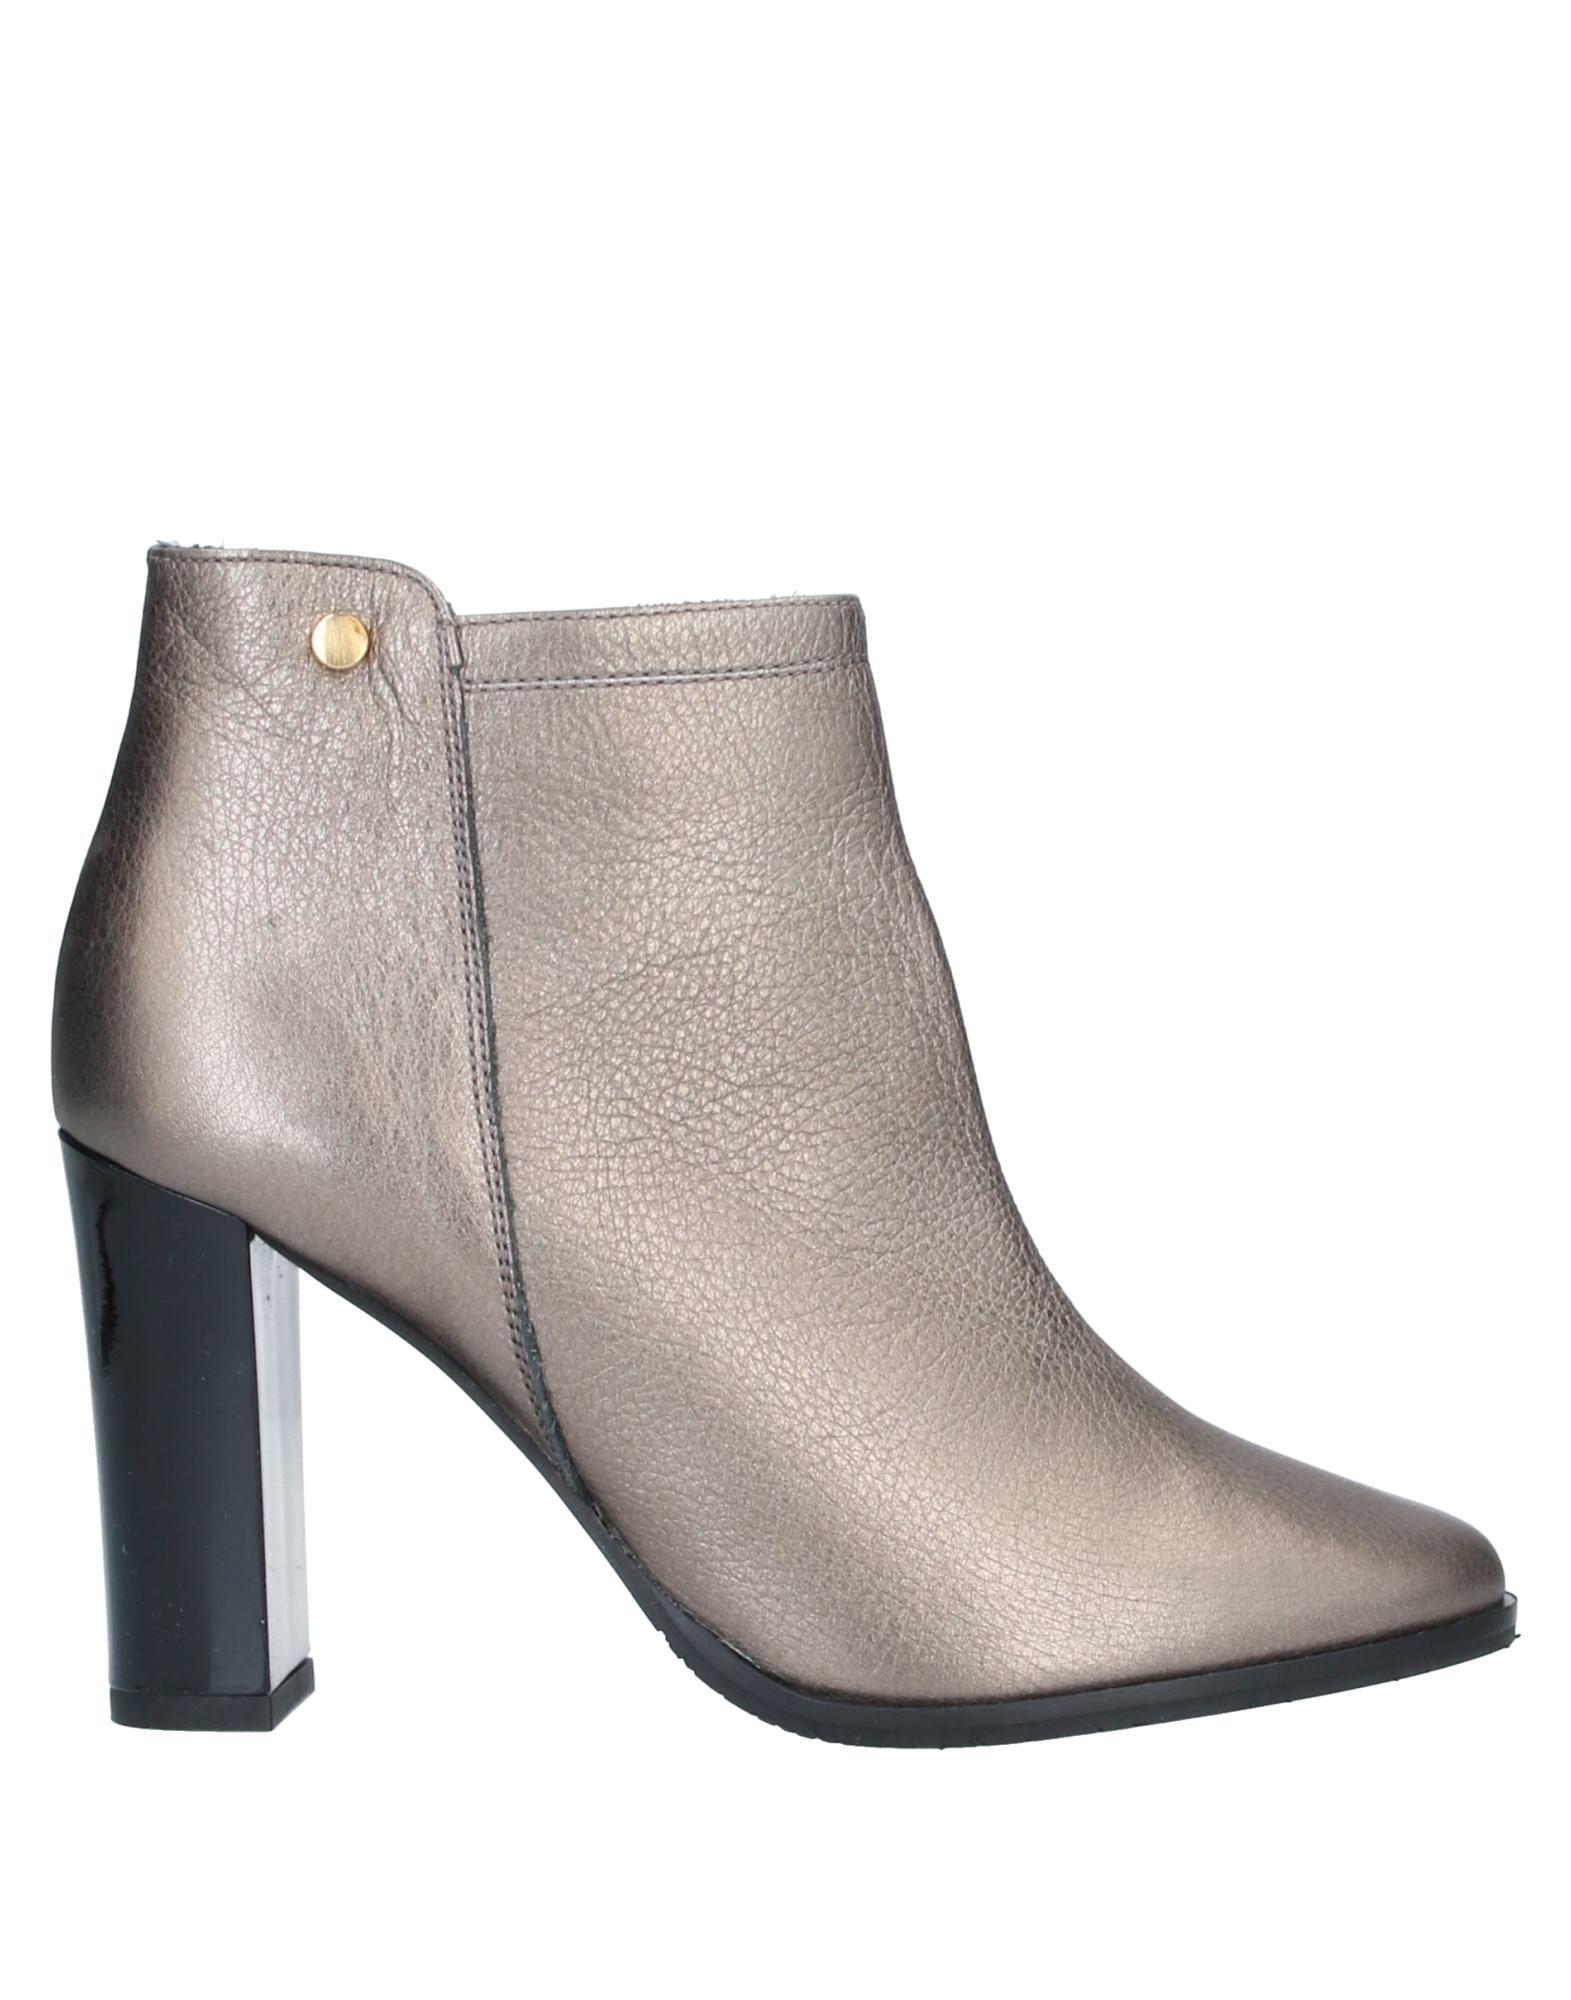 RACHELE NARDI Полусапоги и высокие ботинки nardi fmx07n